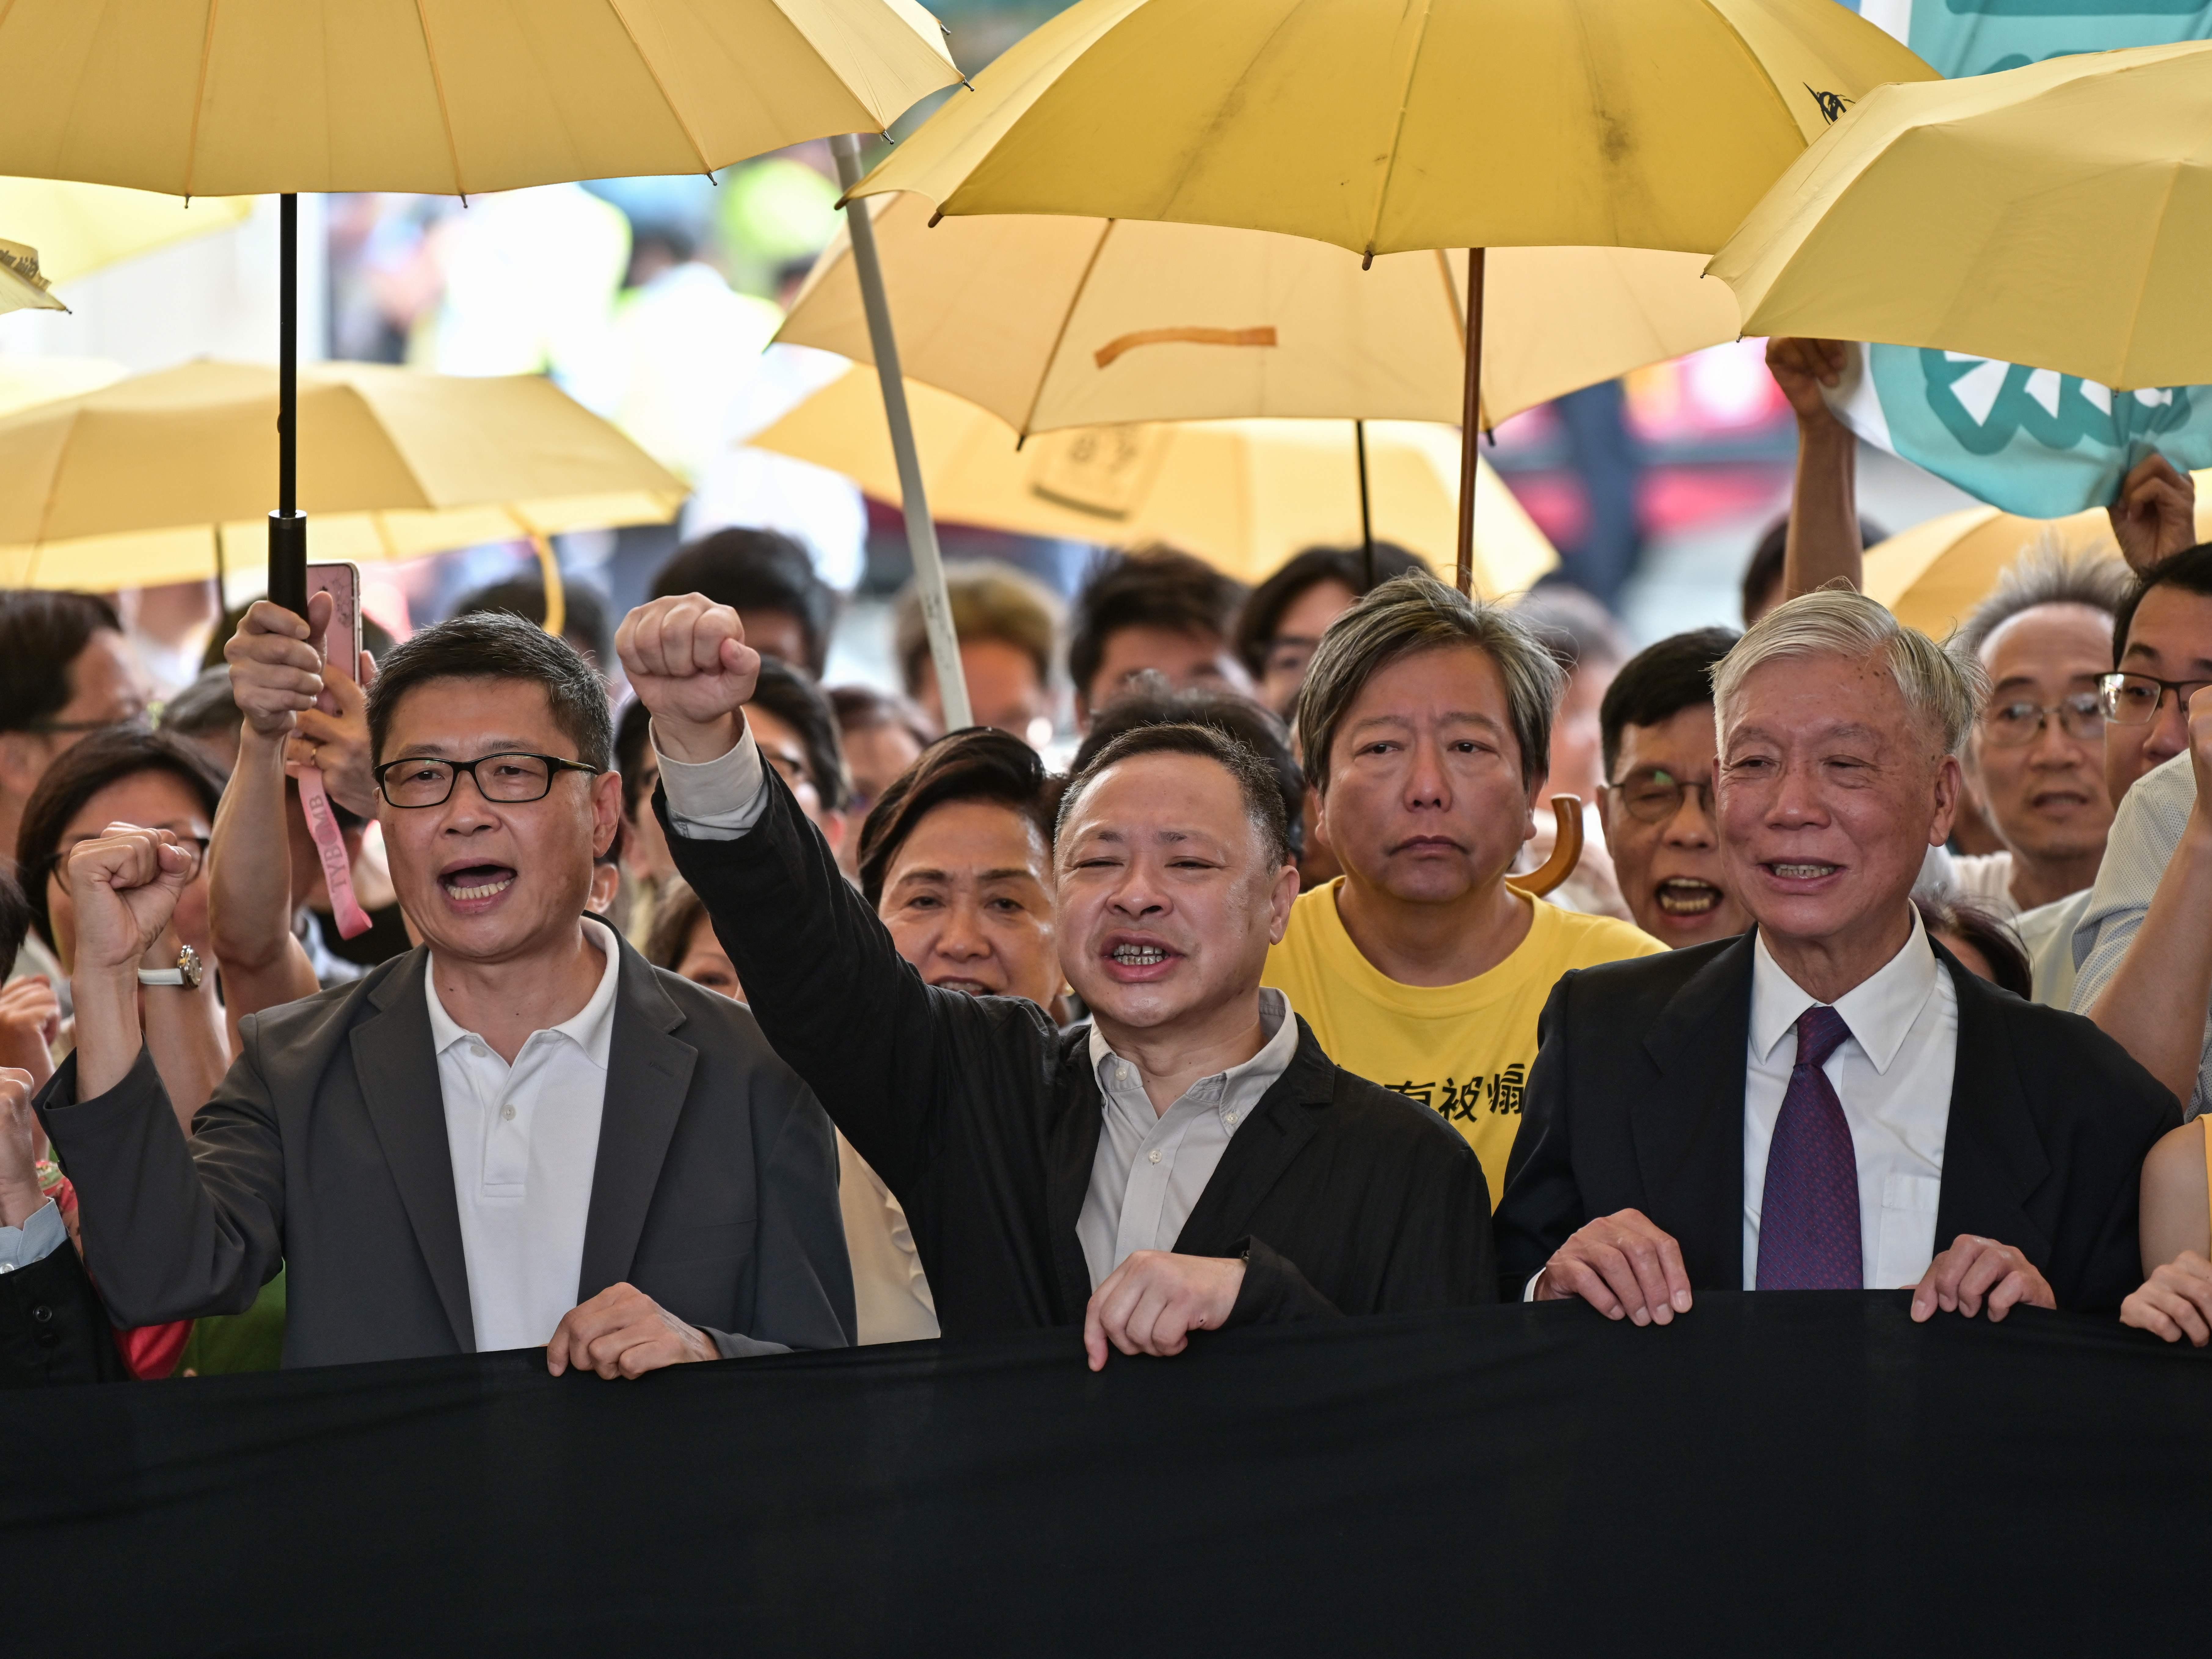 'Umbrella' Protesters Sentenced For 2014 Hong Kong Pro-Democracy Demonstration